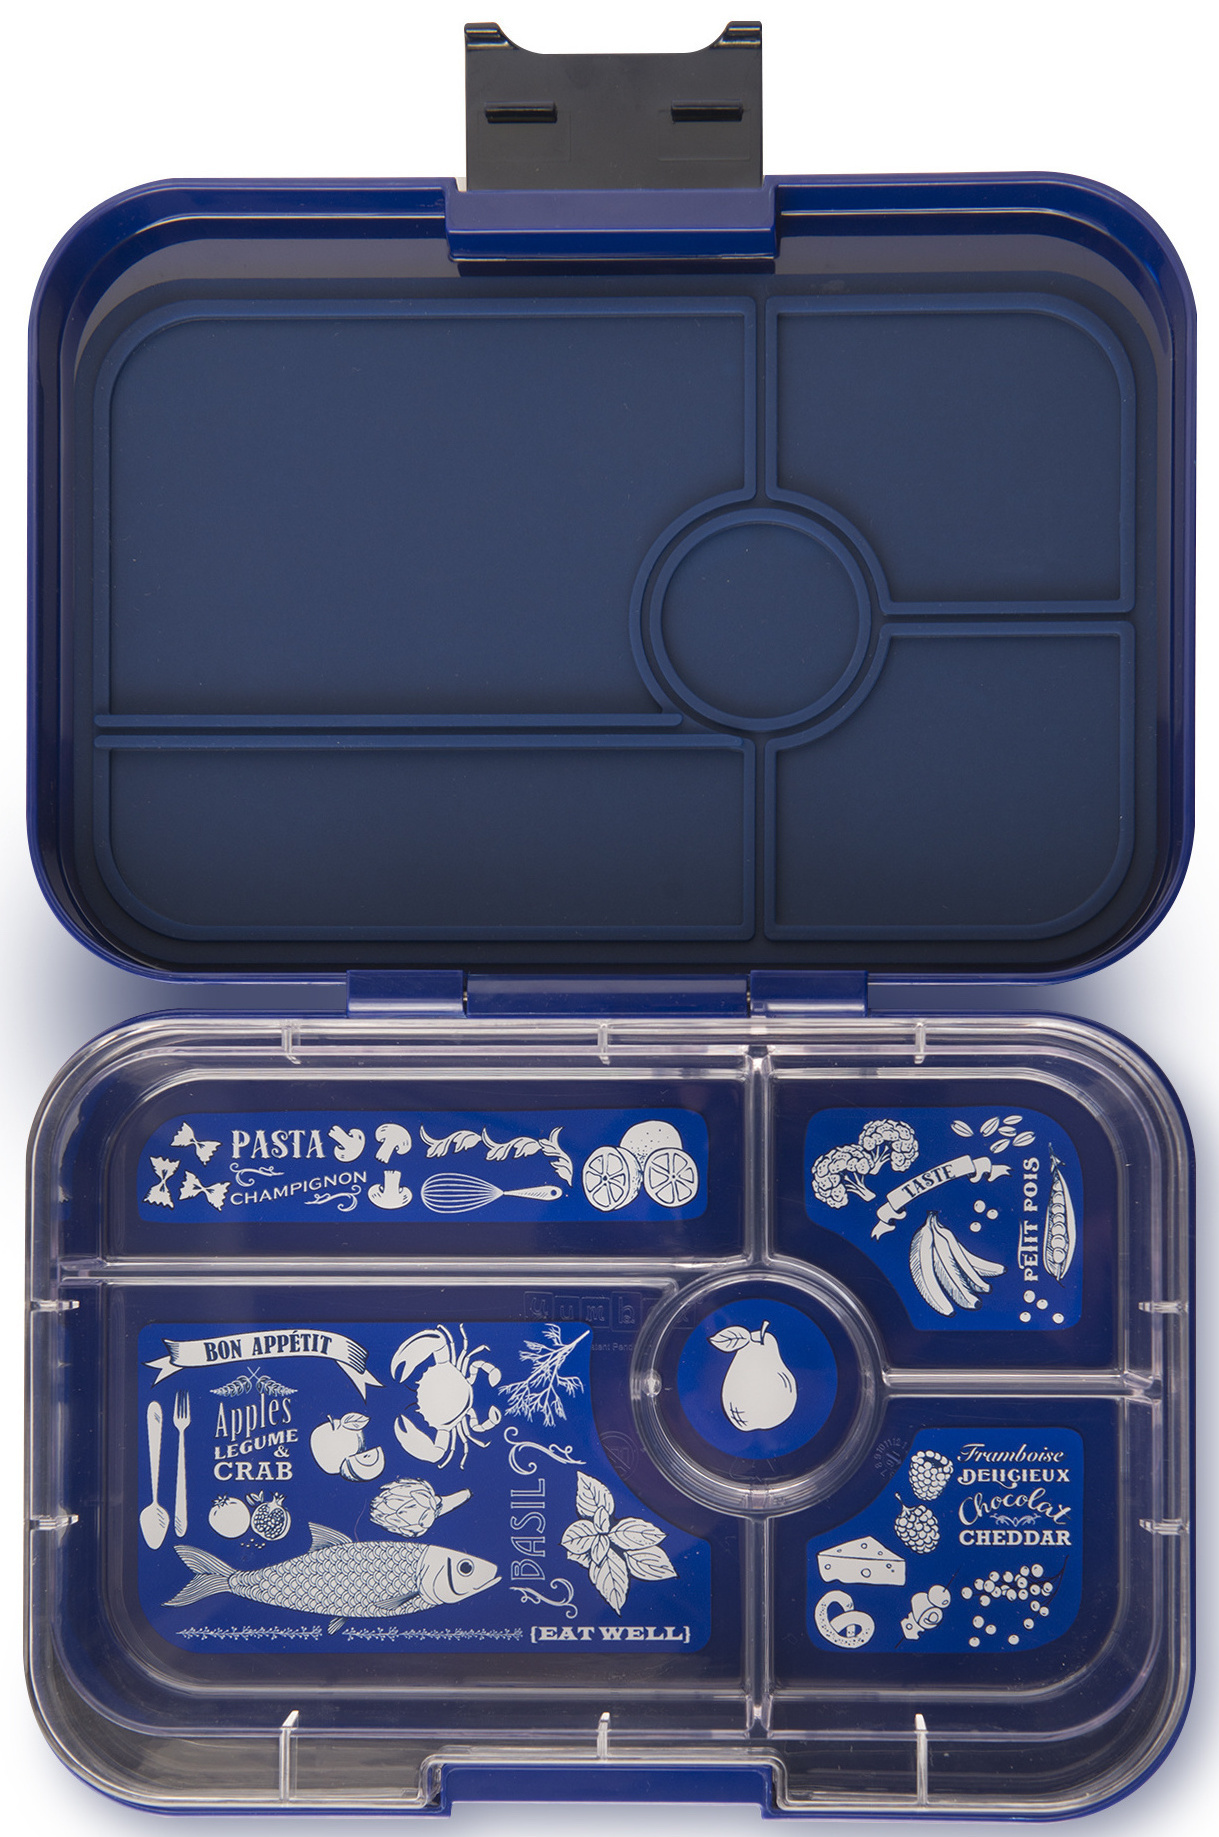 Yumbox Tapas XL lunchtrommel Portofino blauw / Bon appetit tray 5-vakken-1